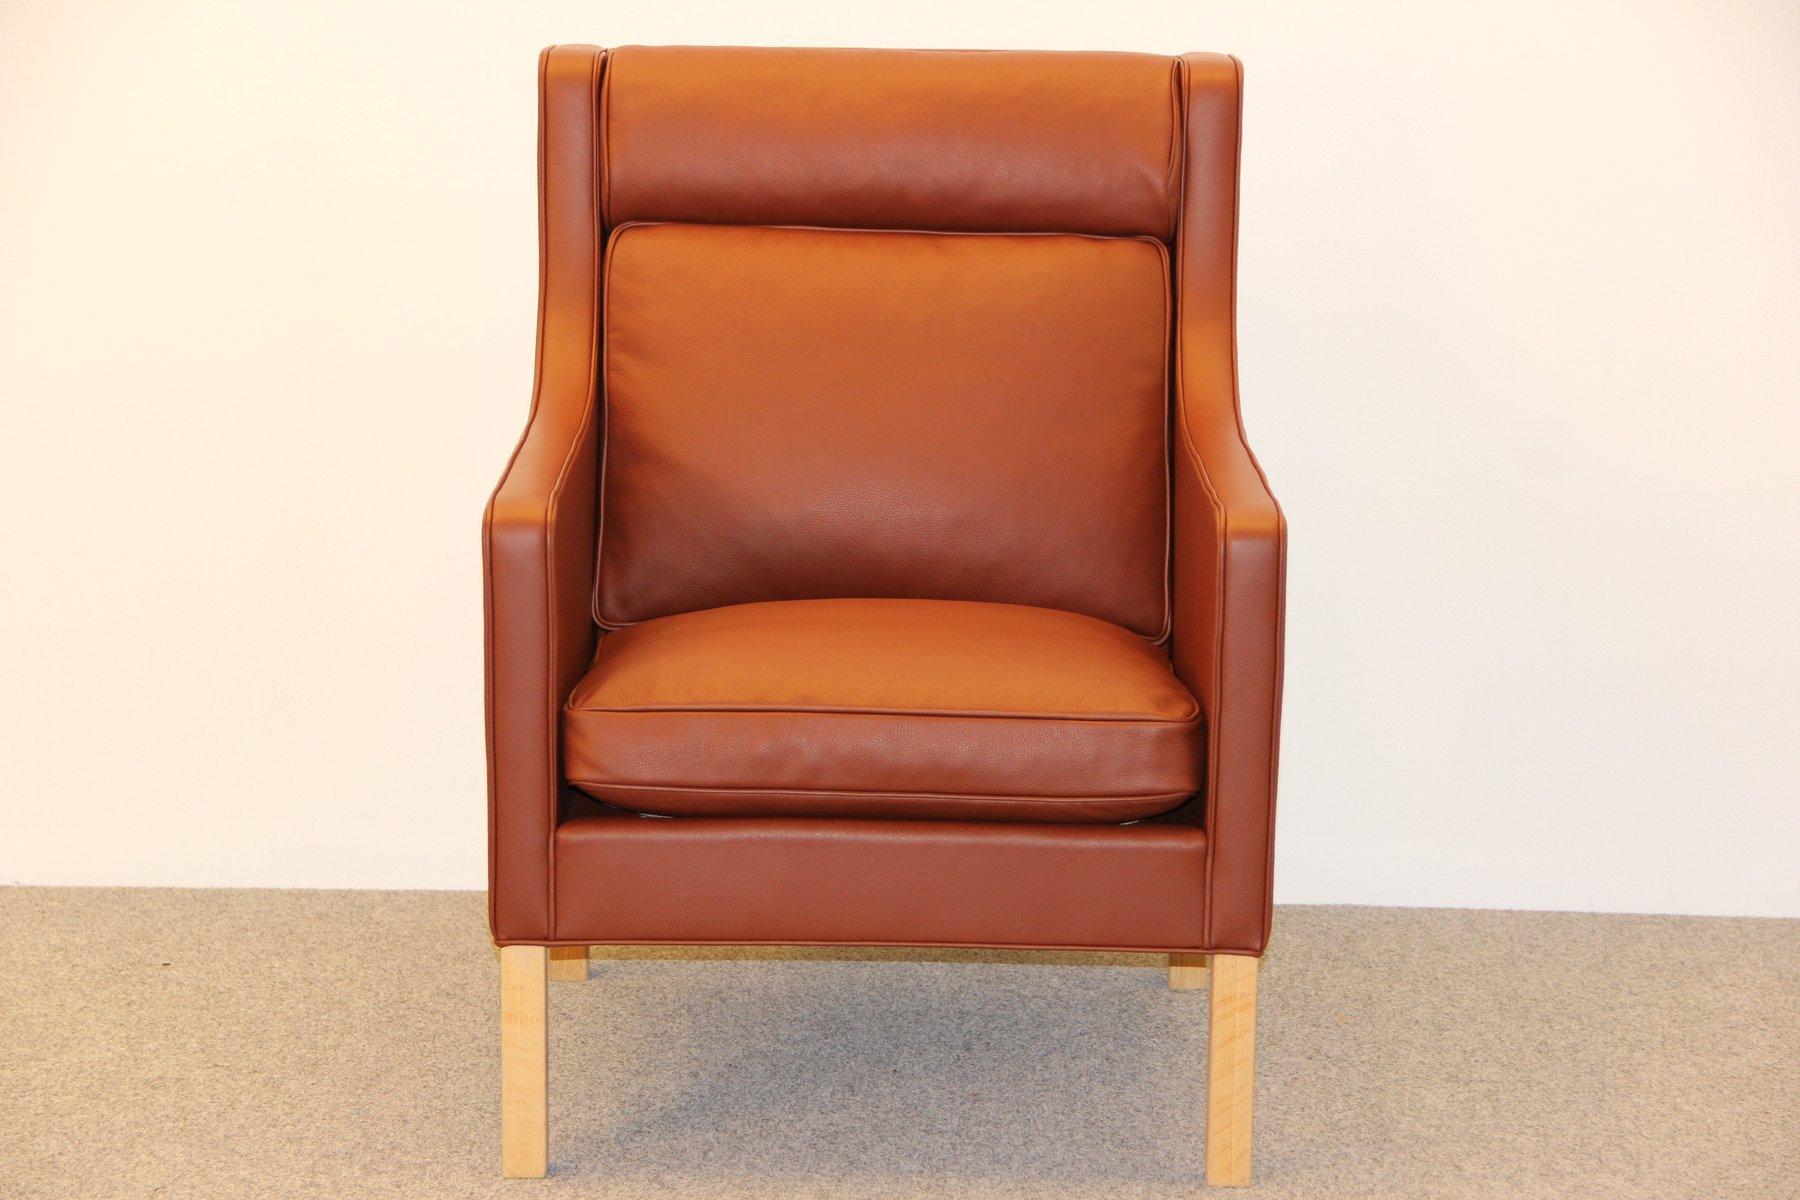 danish model 2431 easy chair by b rge mogensen for. Black Bedroom Furniture Sets. Home Design Ideas